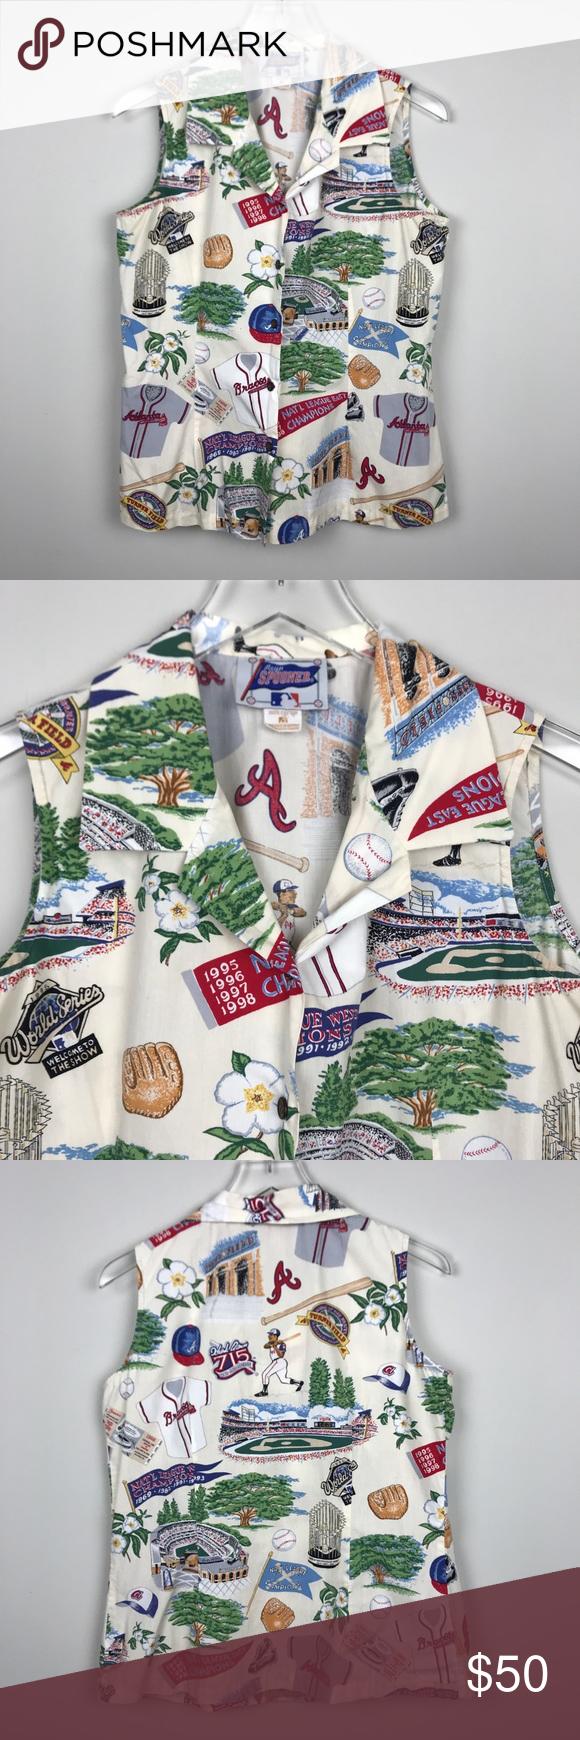 3cccd554 [Reyn Spooner] Vintage Atlanta Braves Shirt MLB M Vintage women's Reyn  Spooner Button down